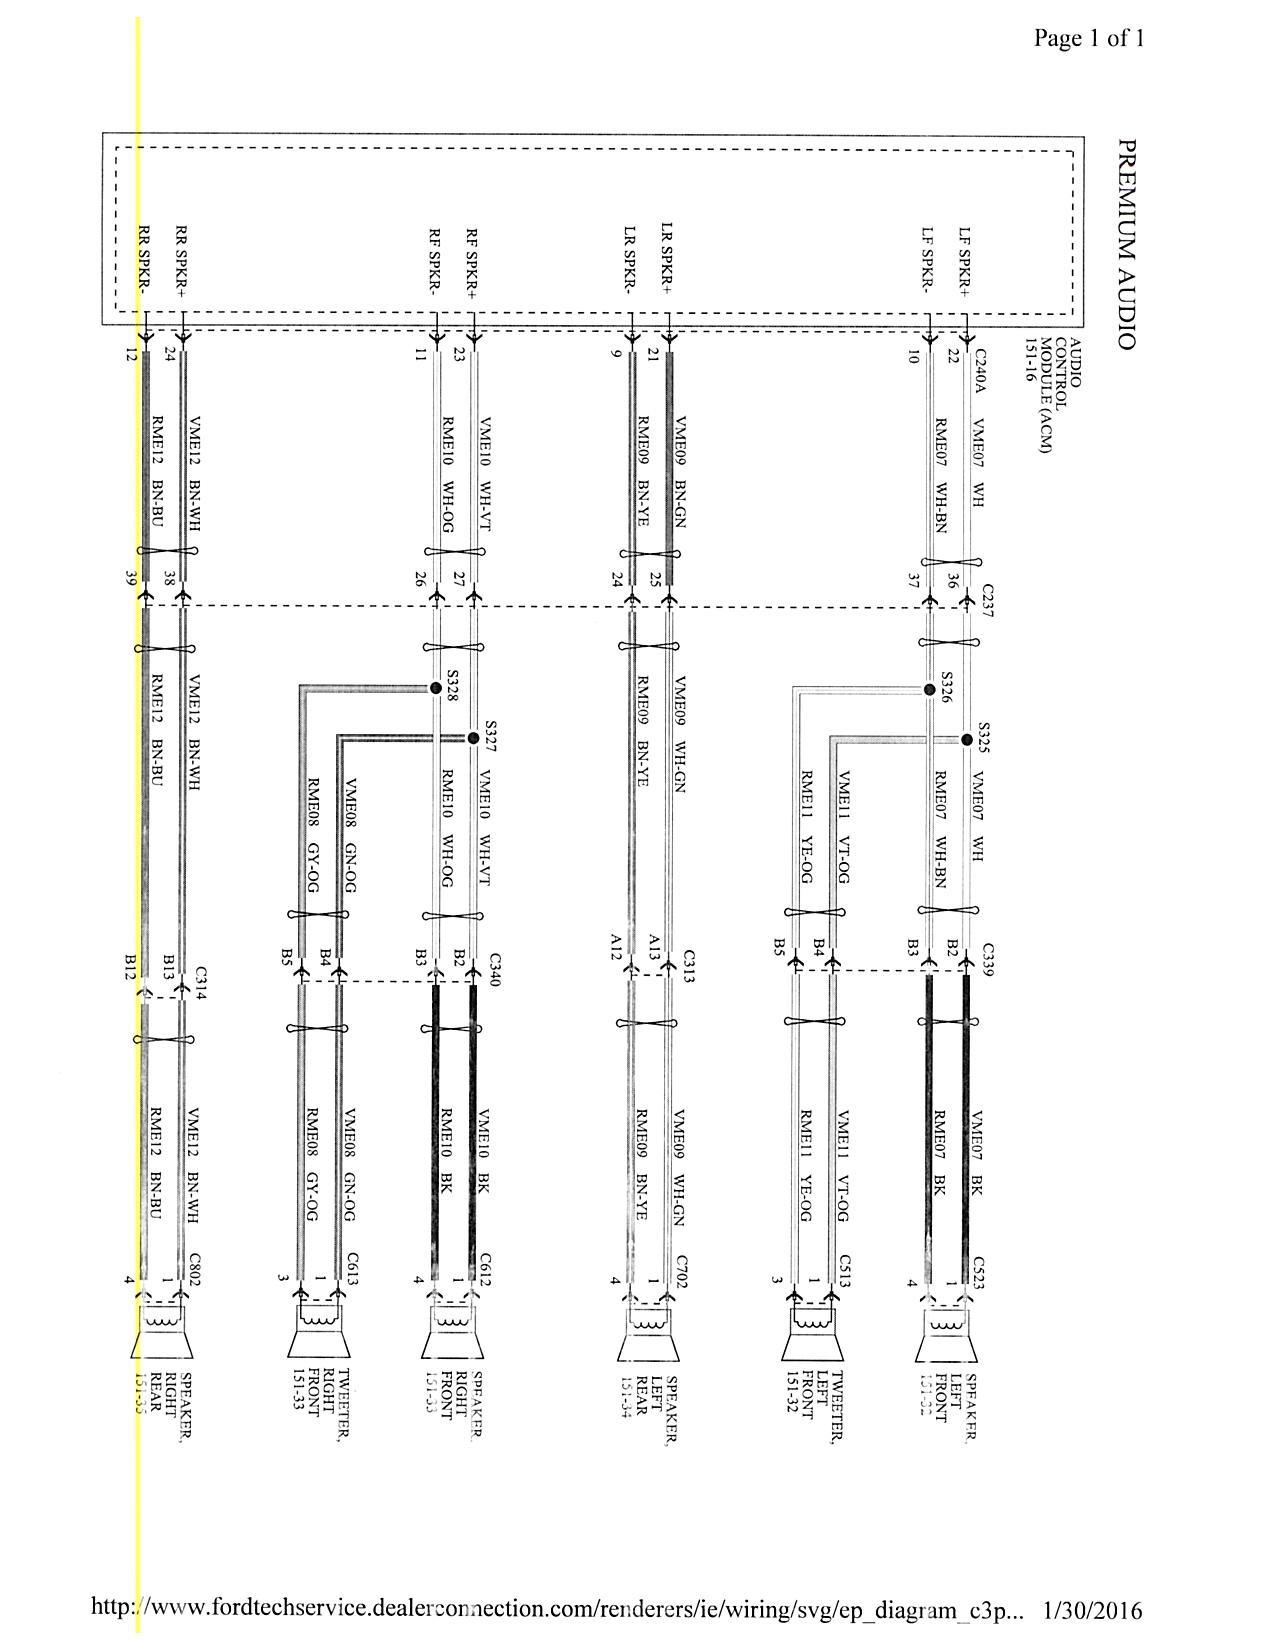 Ford Festiva Stereo Wiring Diagram